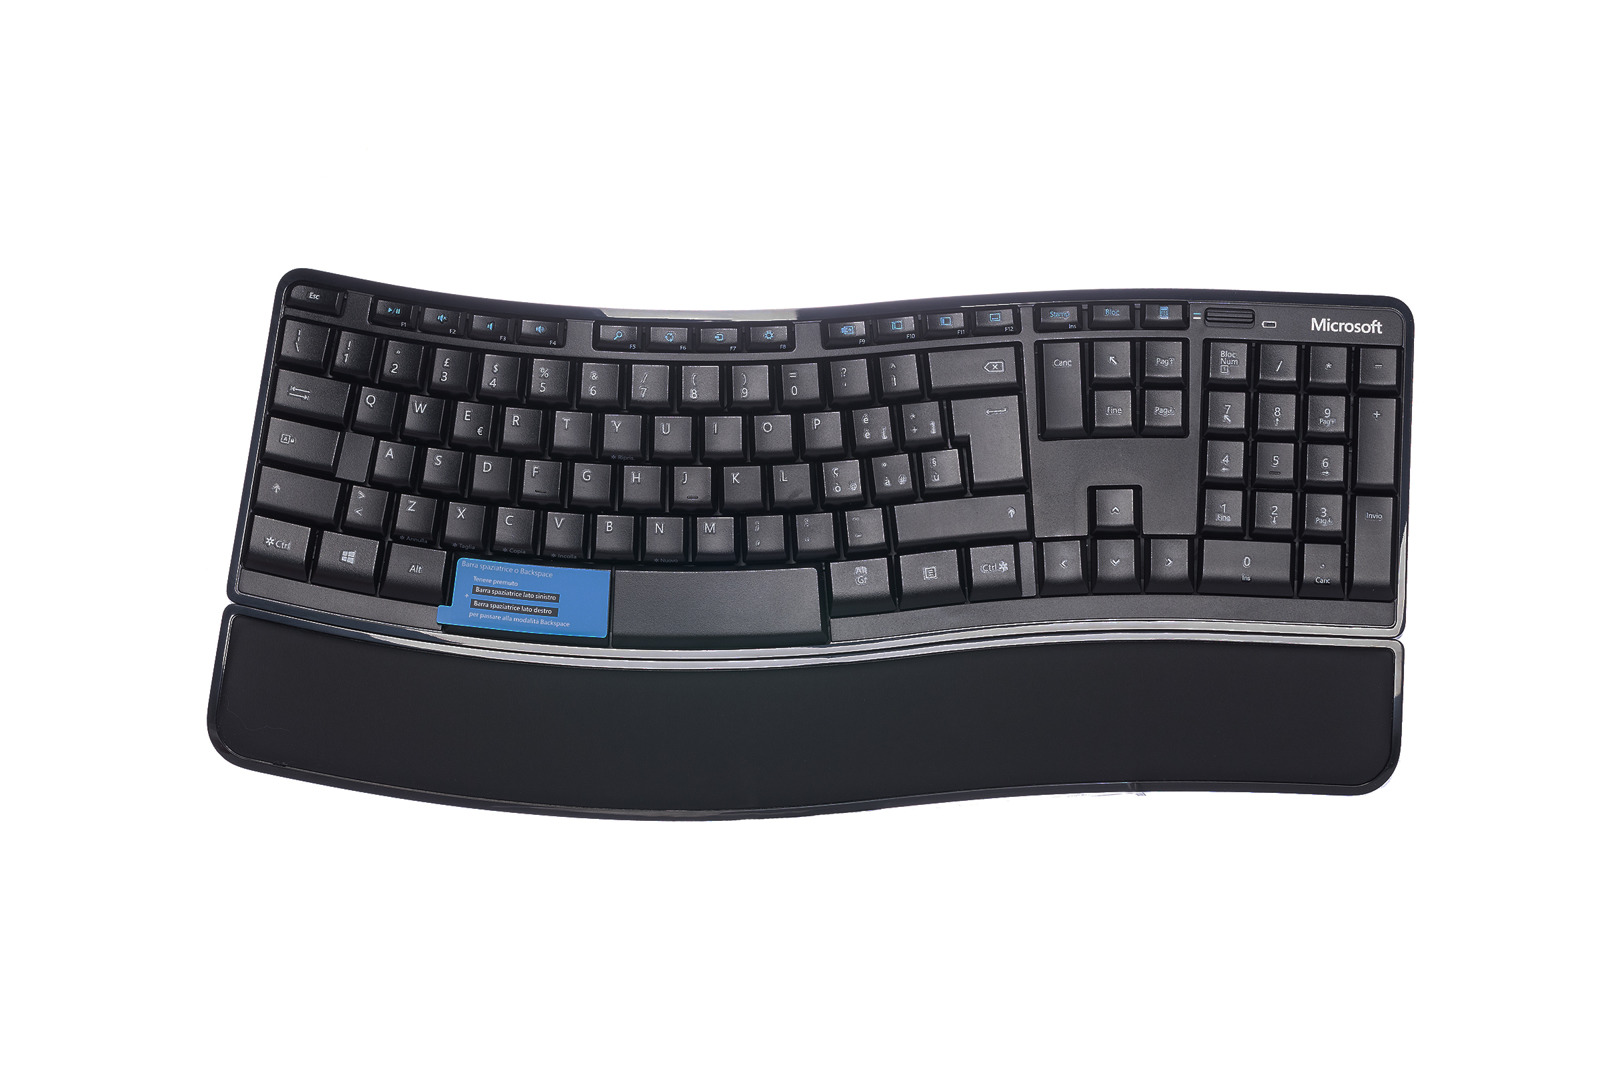 Microsoft Sculpt Comfort (Italian) Keyboard V5S-00009 QWERTY